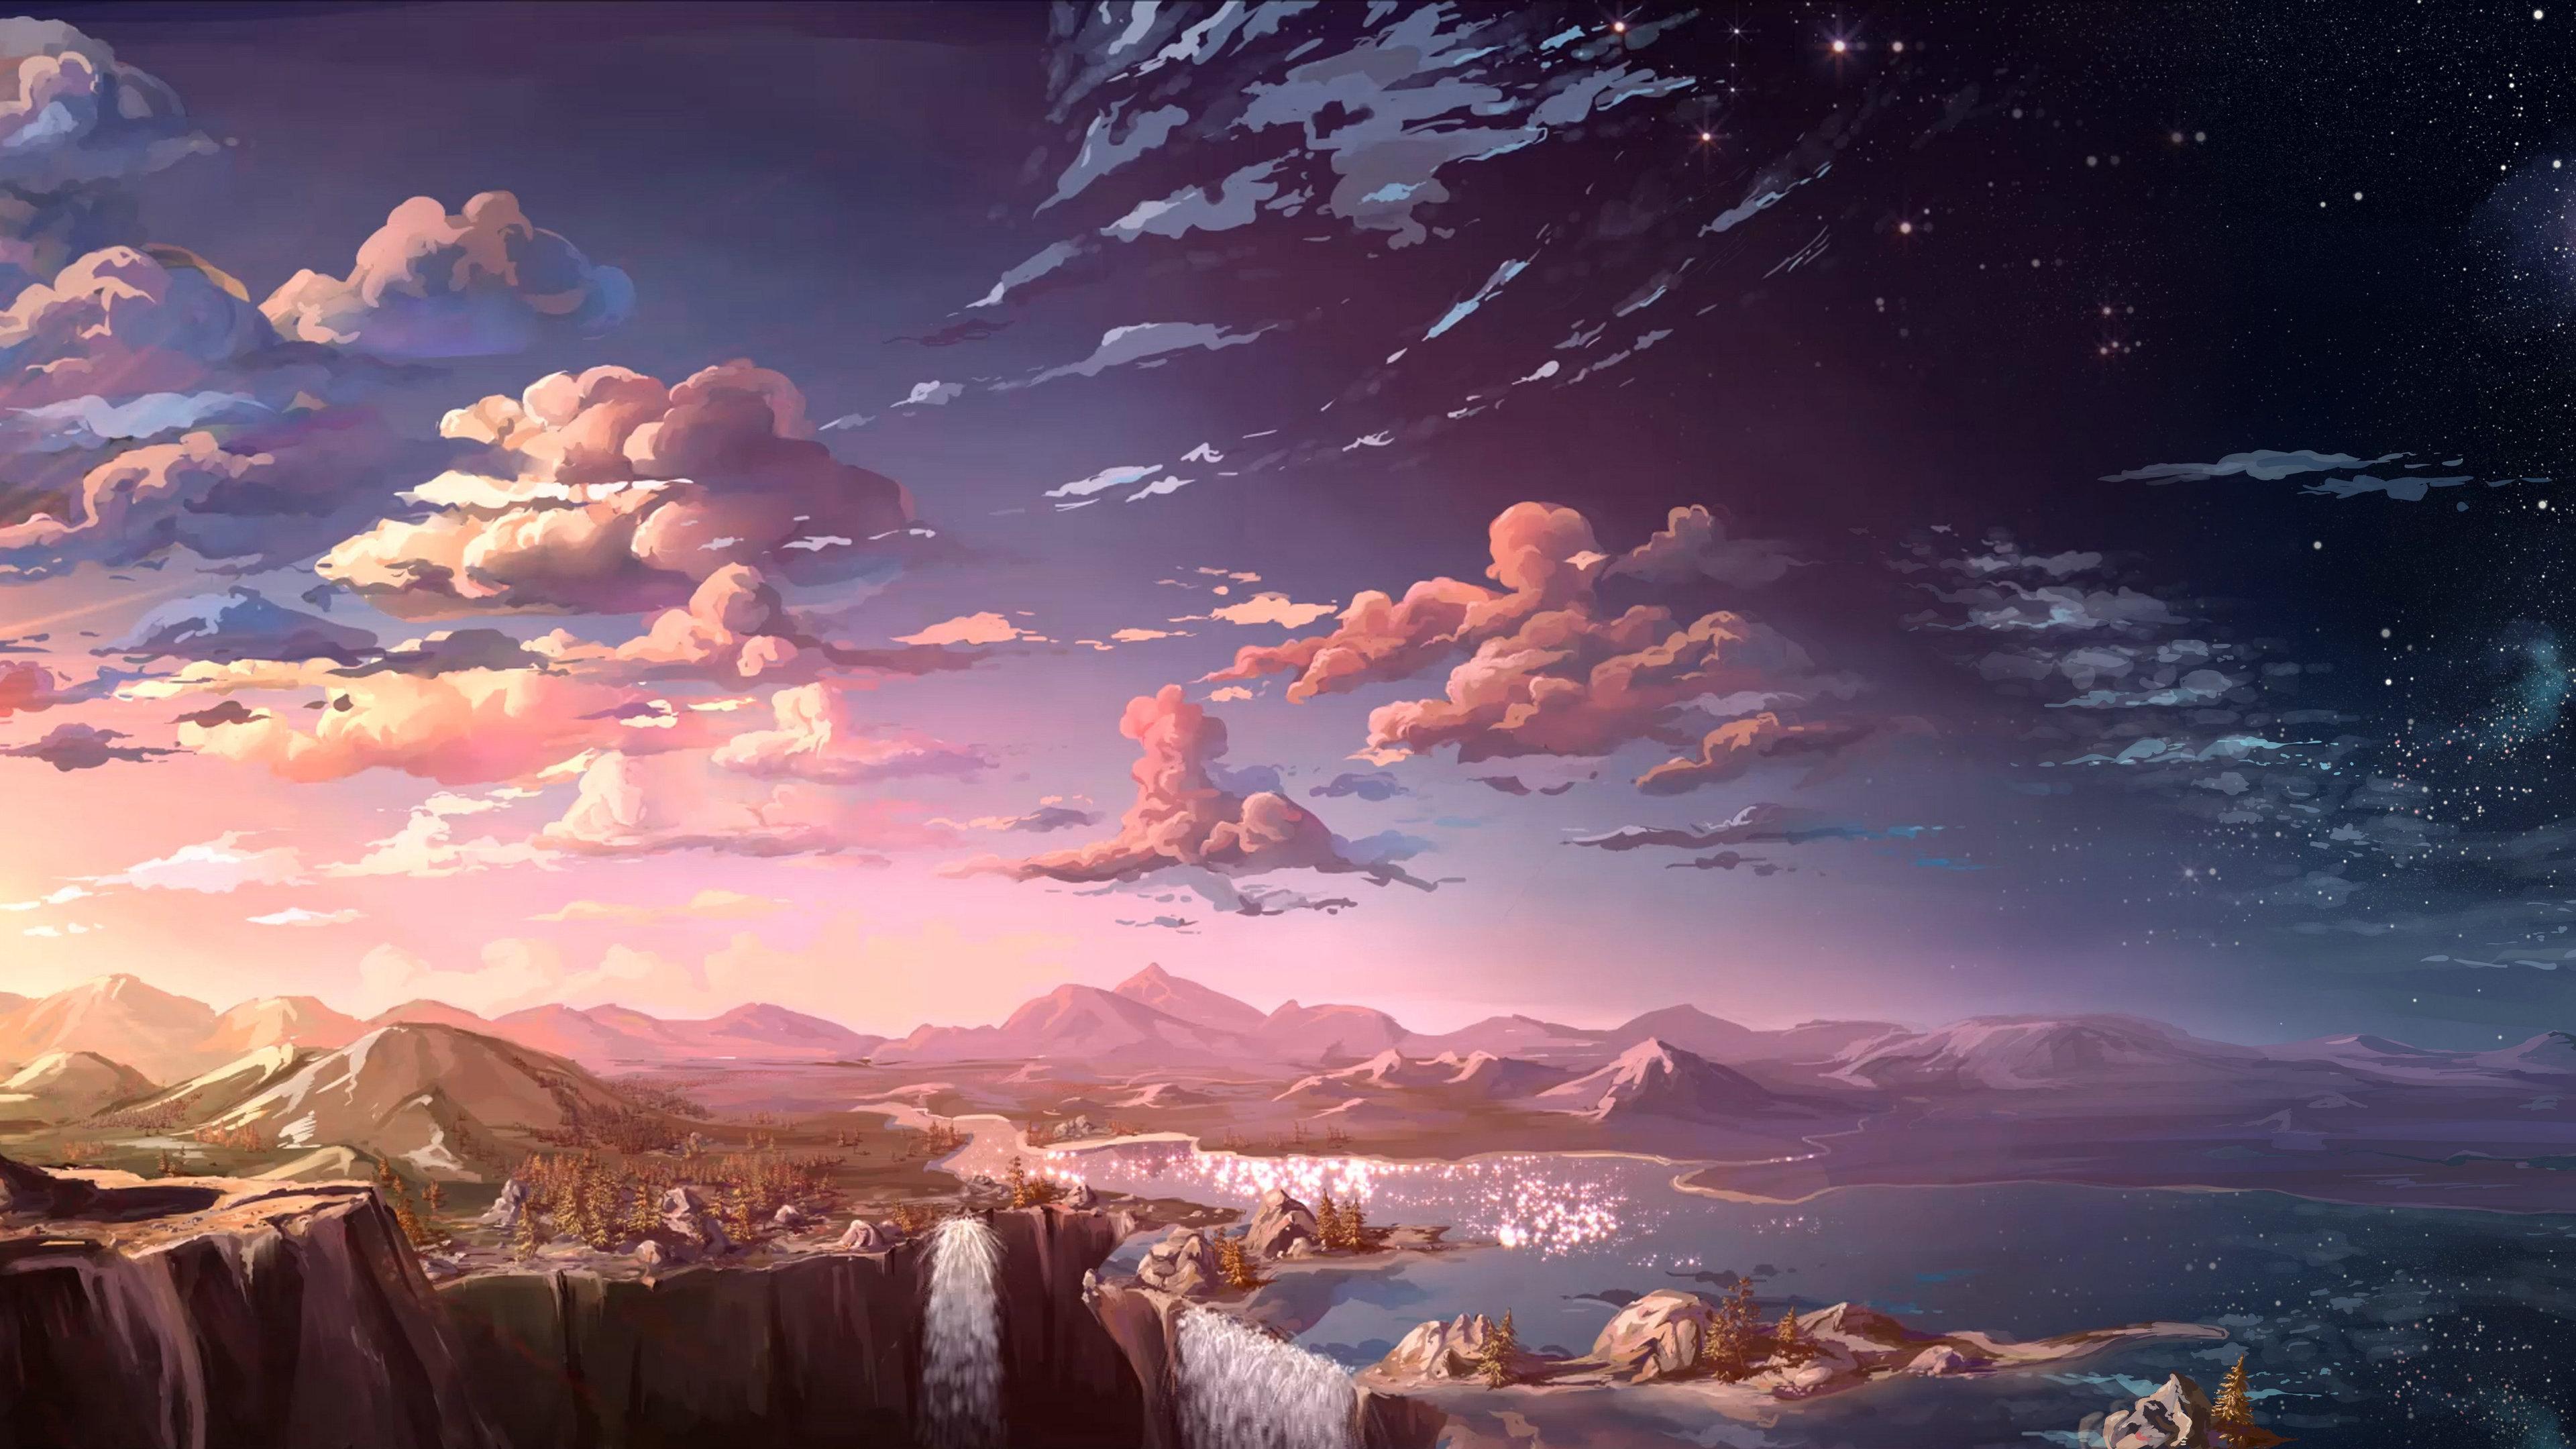 anime landscape waterfall cloud 4k 1541974157 - Anime Landscape Waterfall Cloud 4k - waterfall wallpapers, landscape wallpapers, hd-wallpapers, digital art wallpapers, cloud wallpapers, artwork wallpapers, artist wallpapers, anime wallpapers, 4k-wallpapers